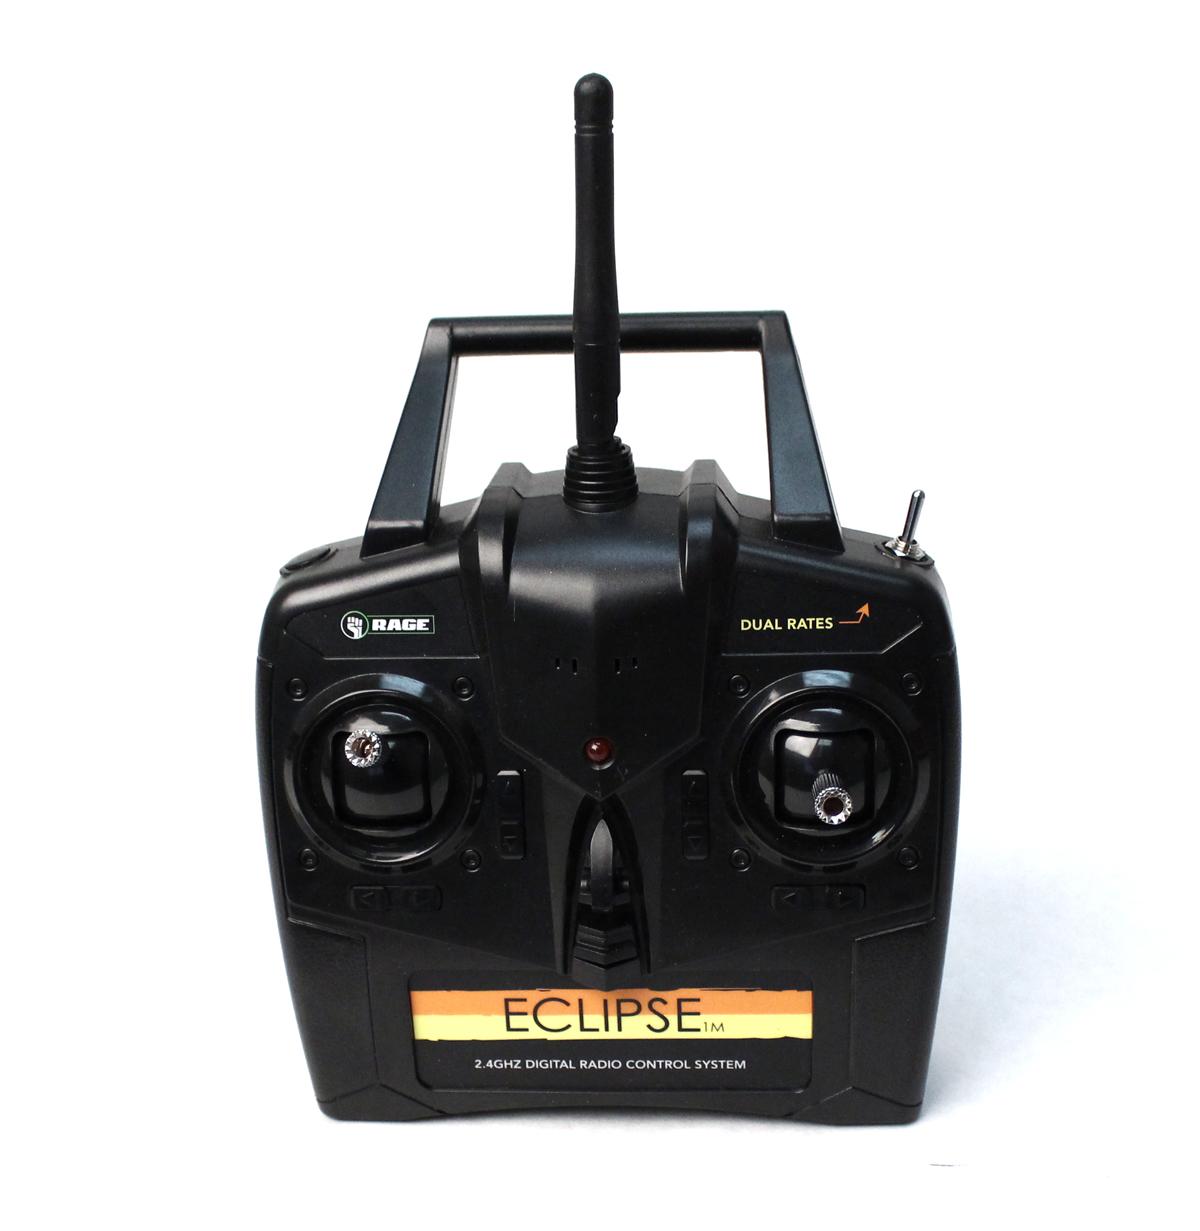 2.4Ghz 2-Channel Transmitter: Eclipse